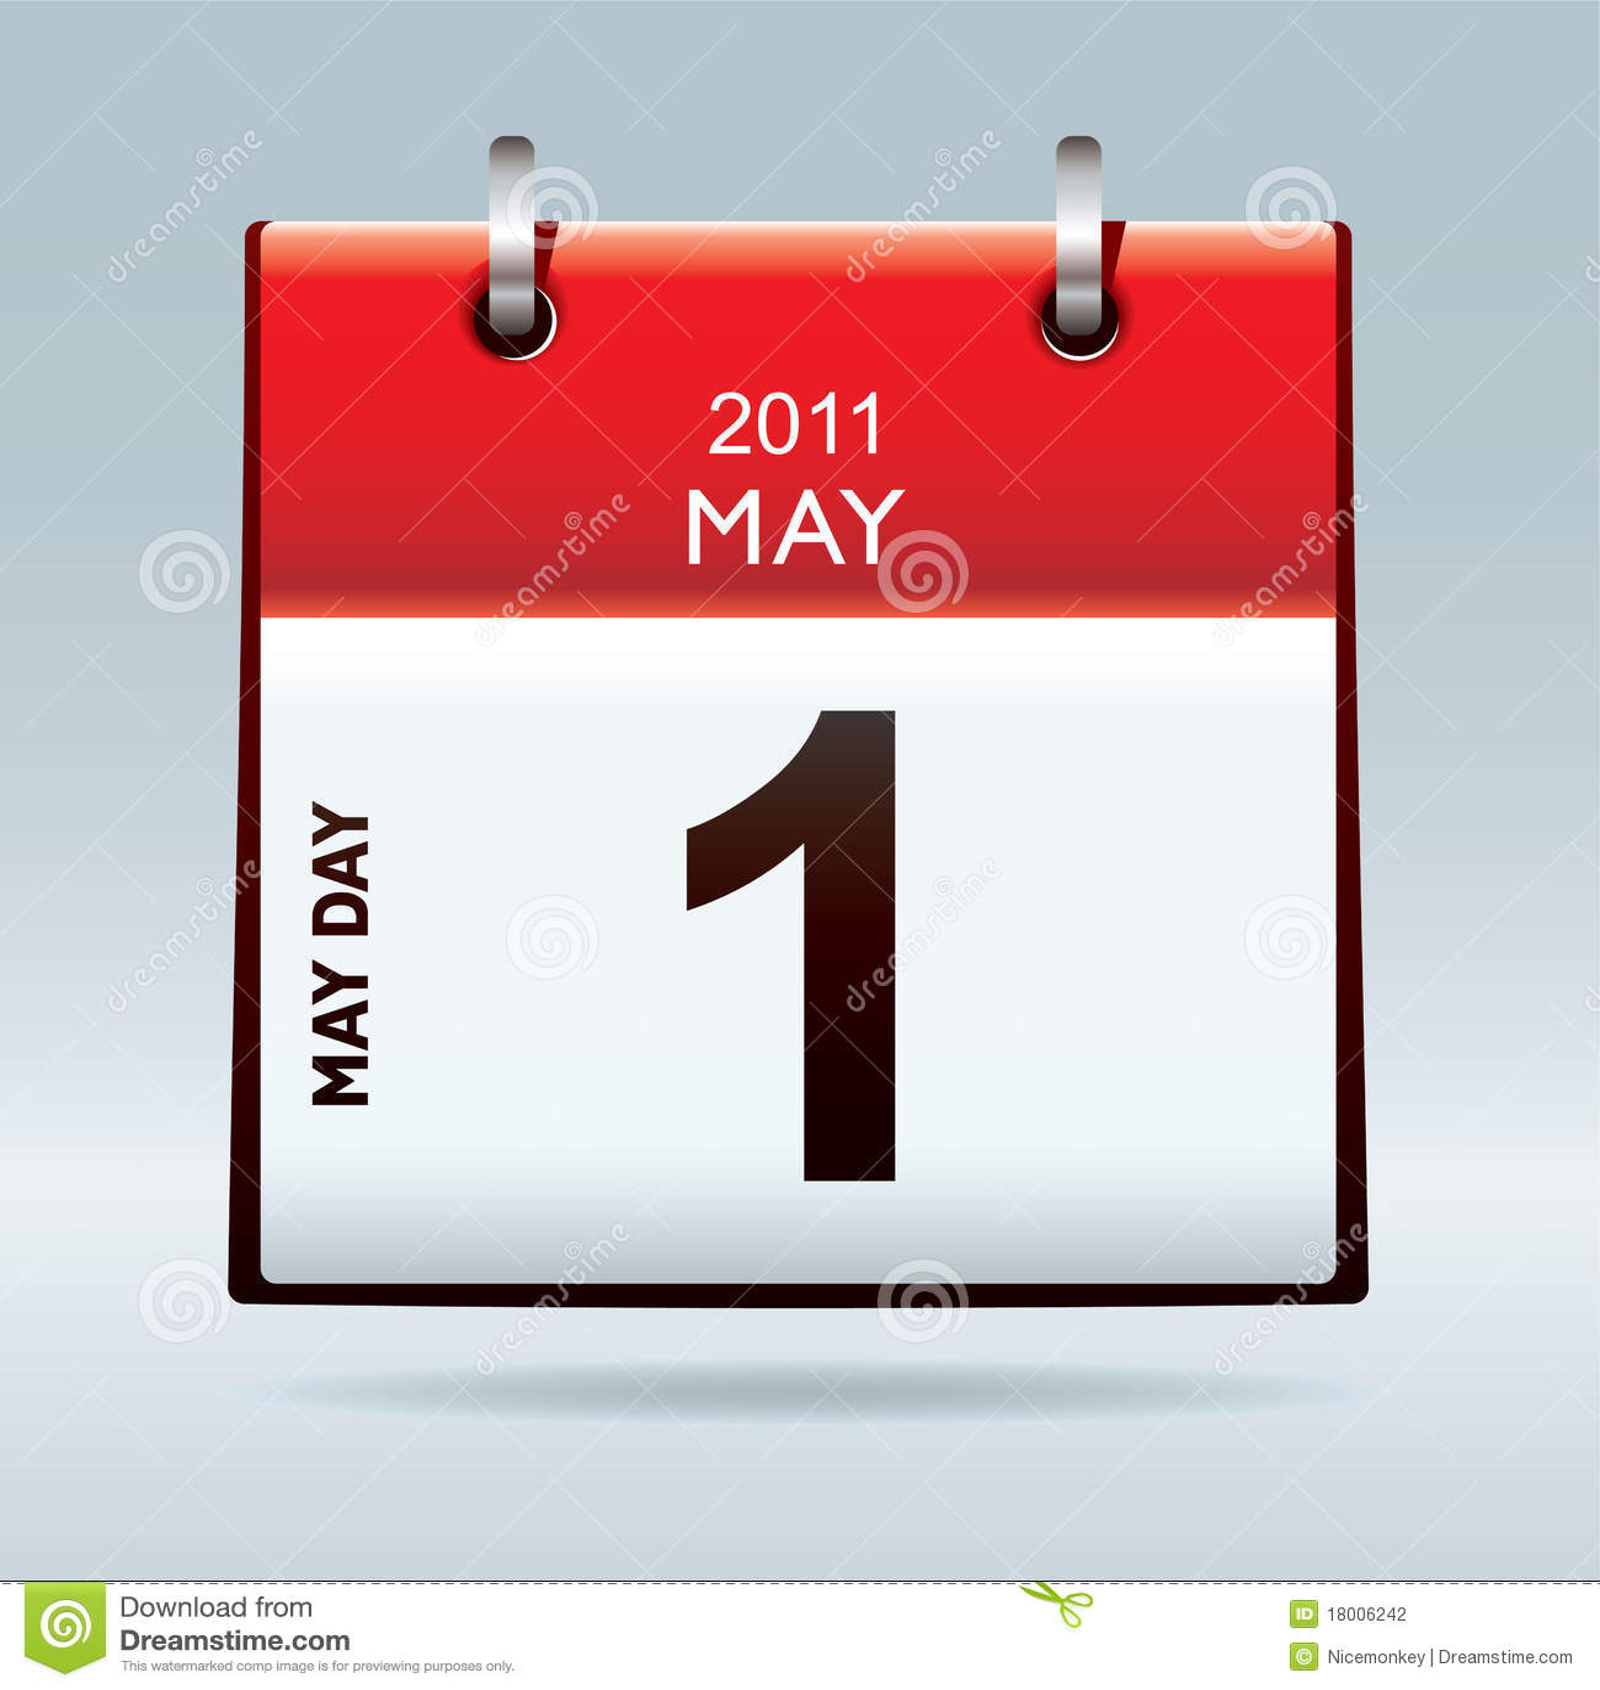 Calendar May Icon : May day calendar icon stock photography image